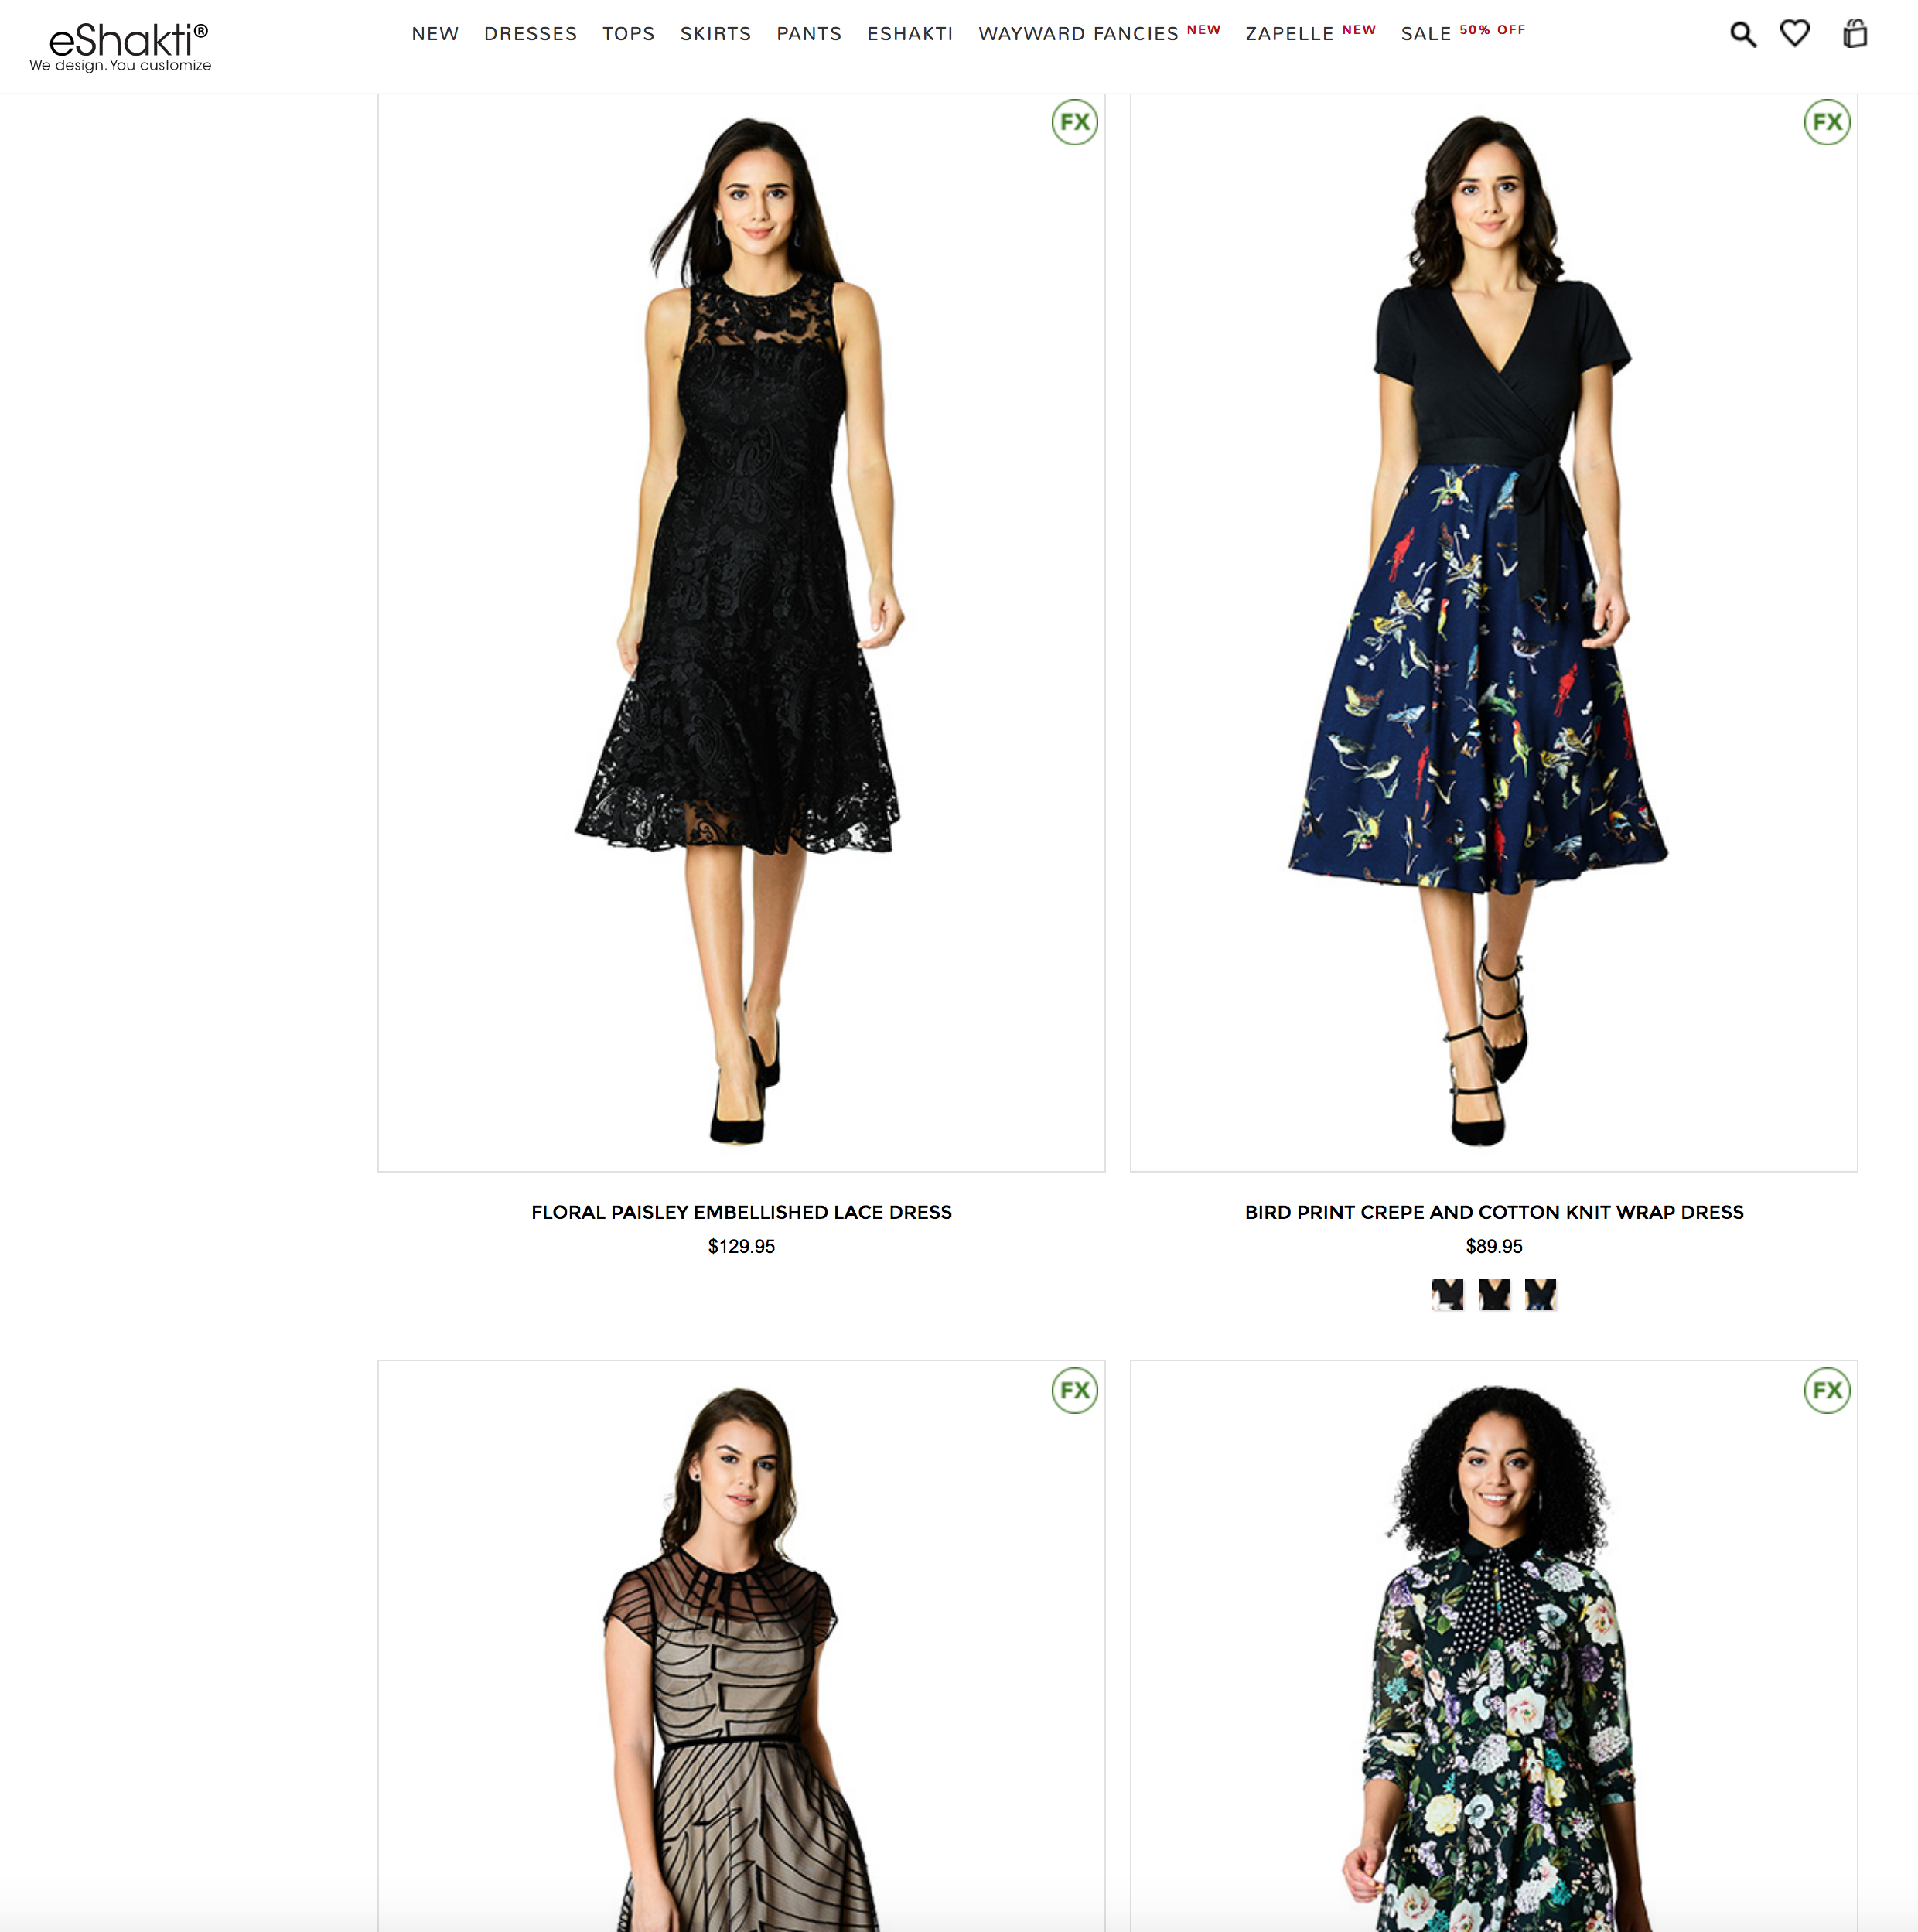 eShakti FX dresses - yoursassyself.com